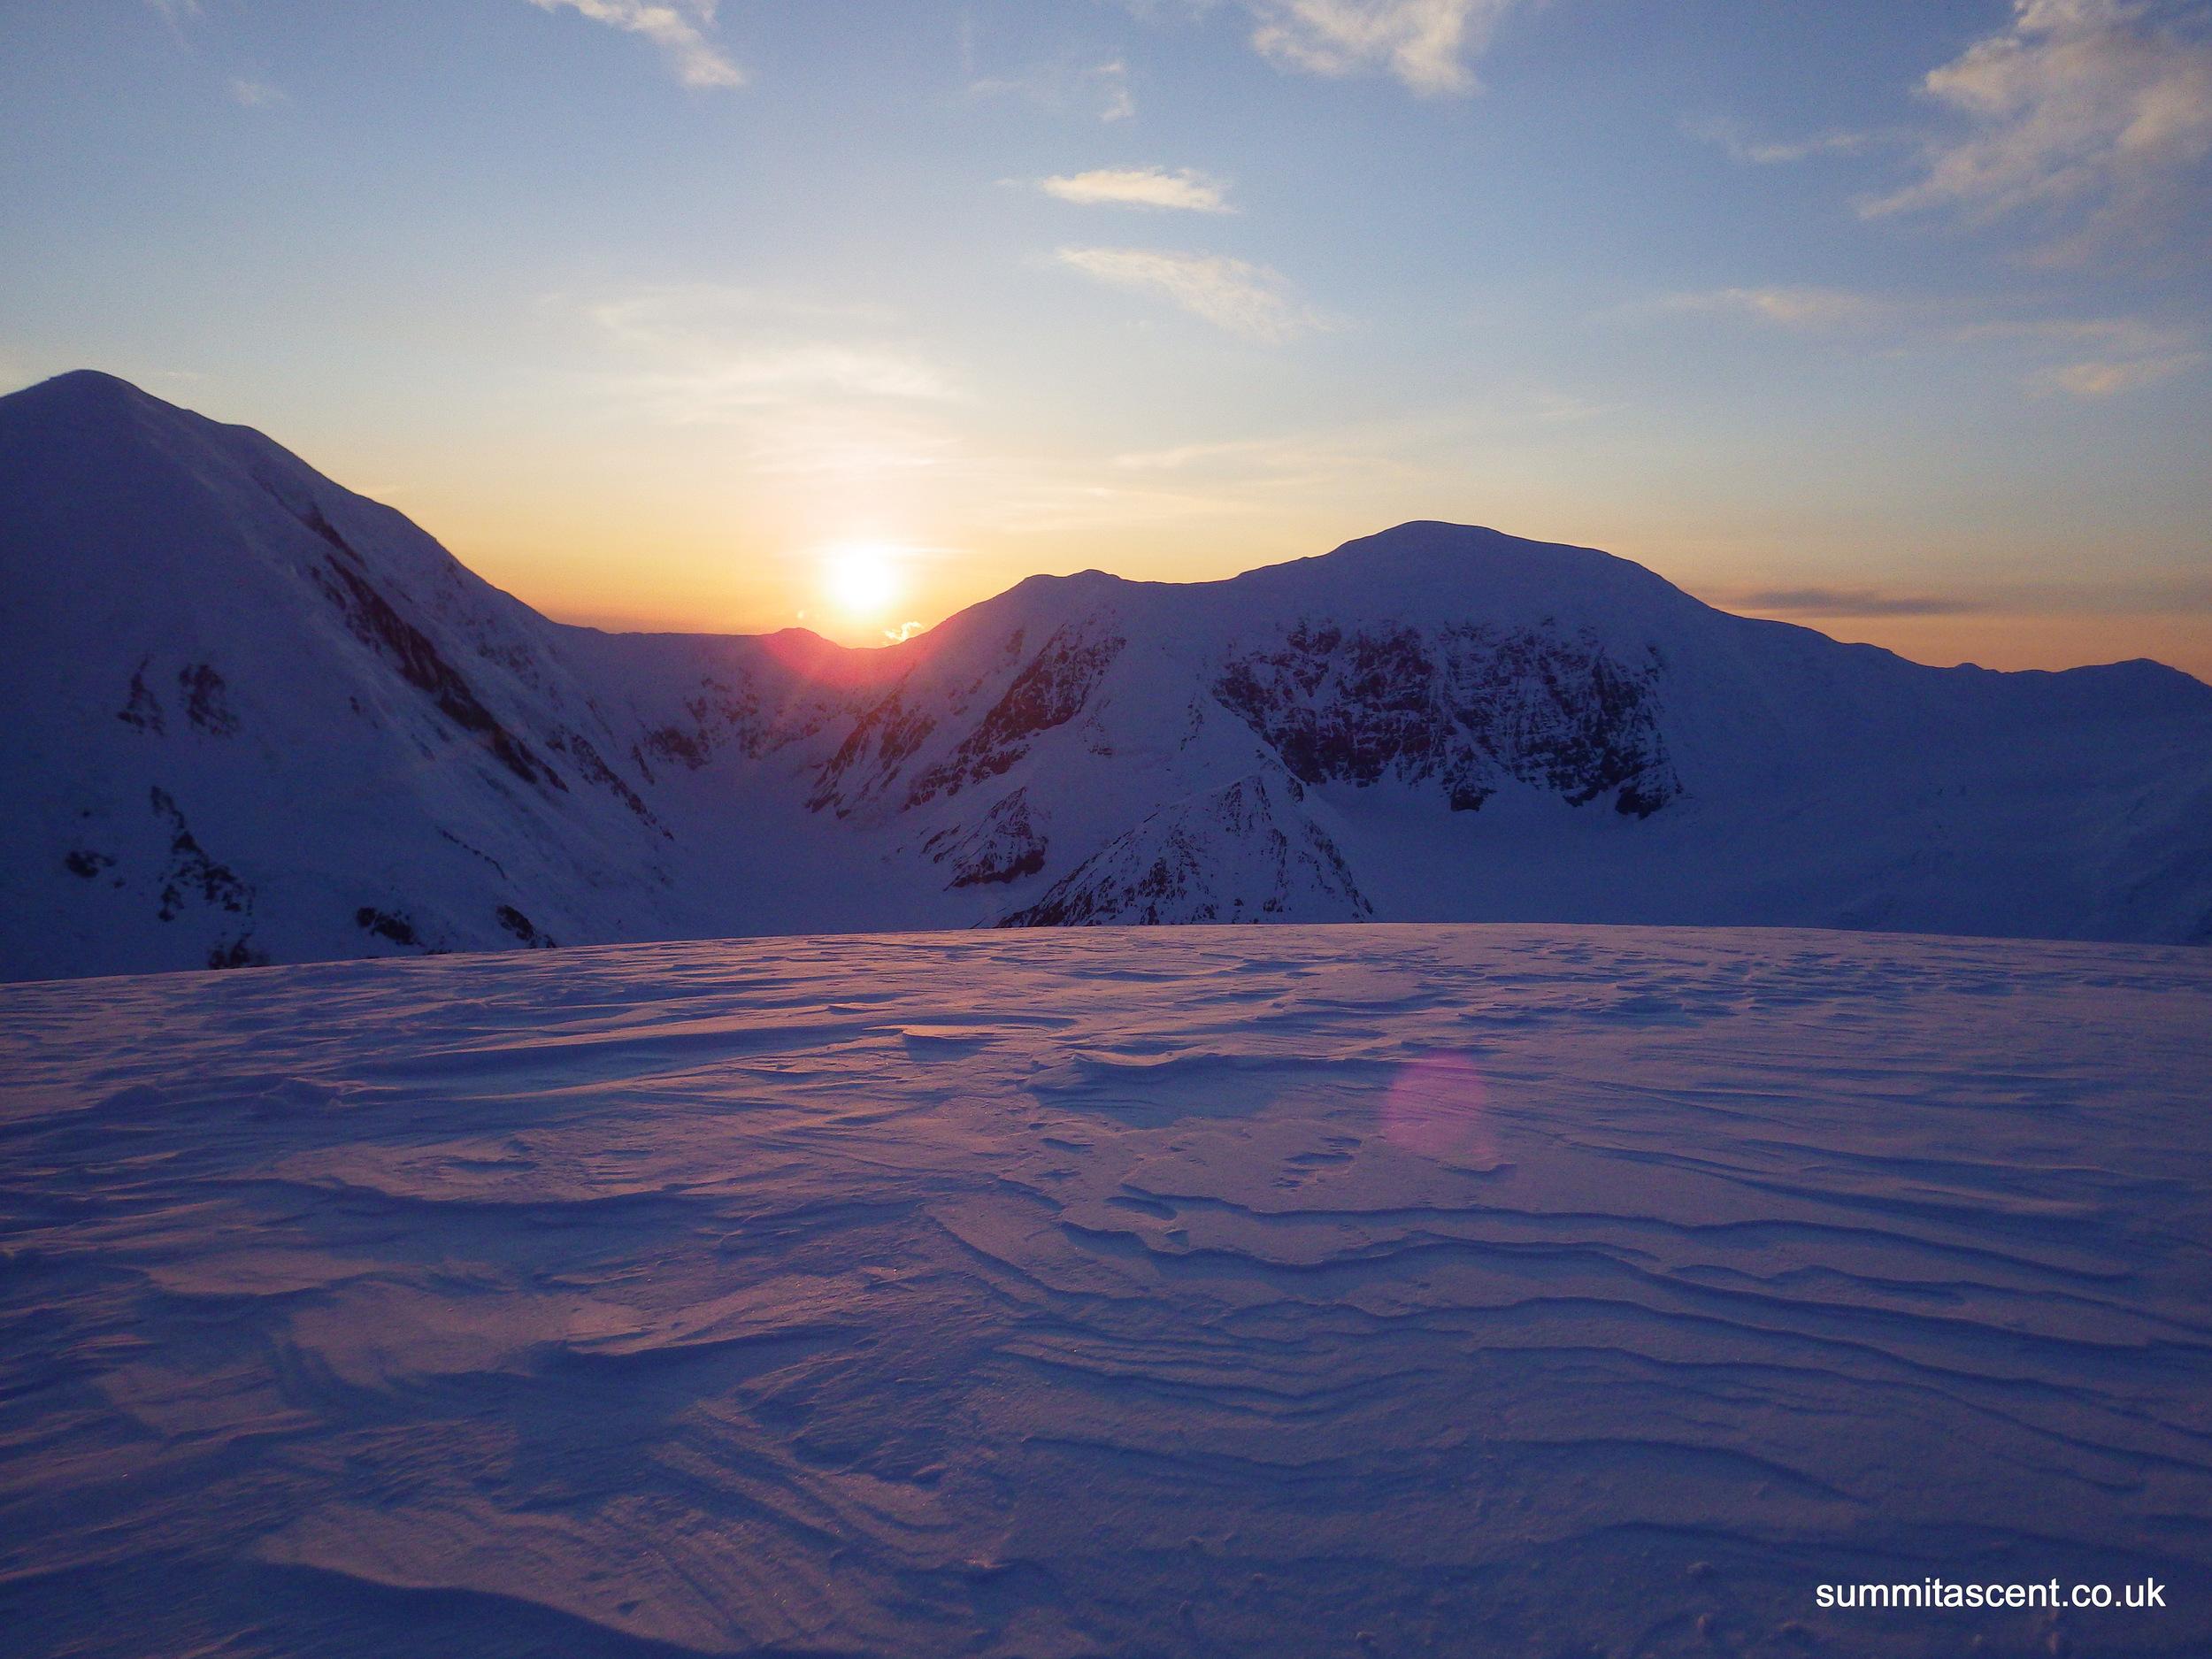 Summit, Mount Frances